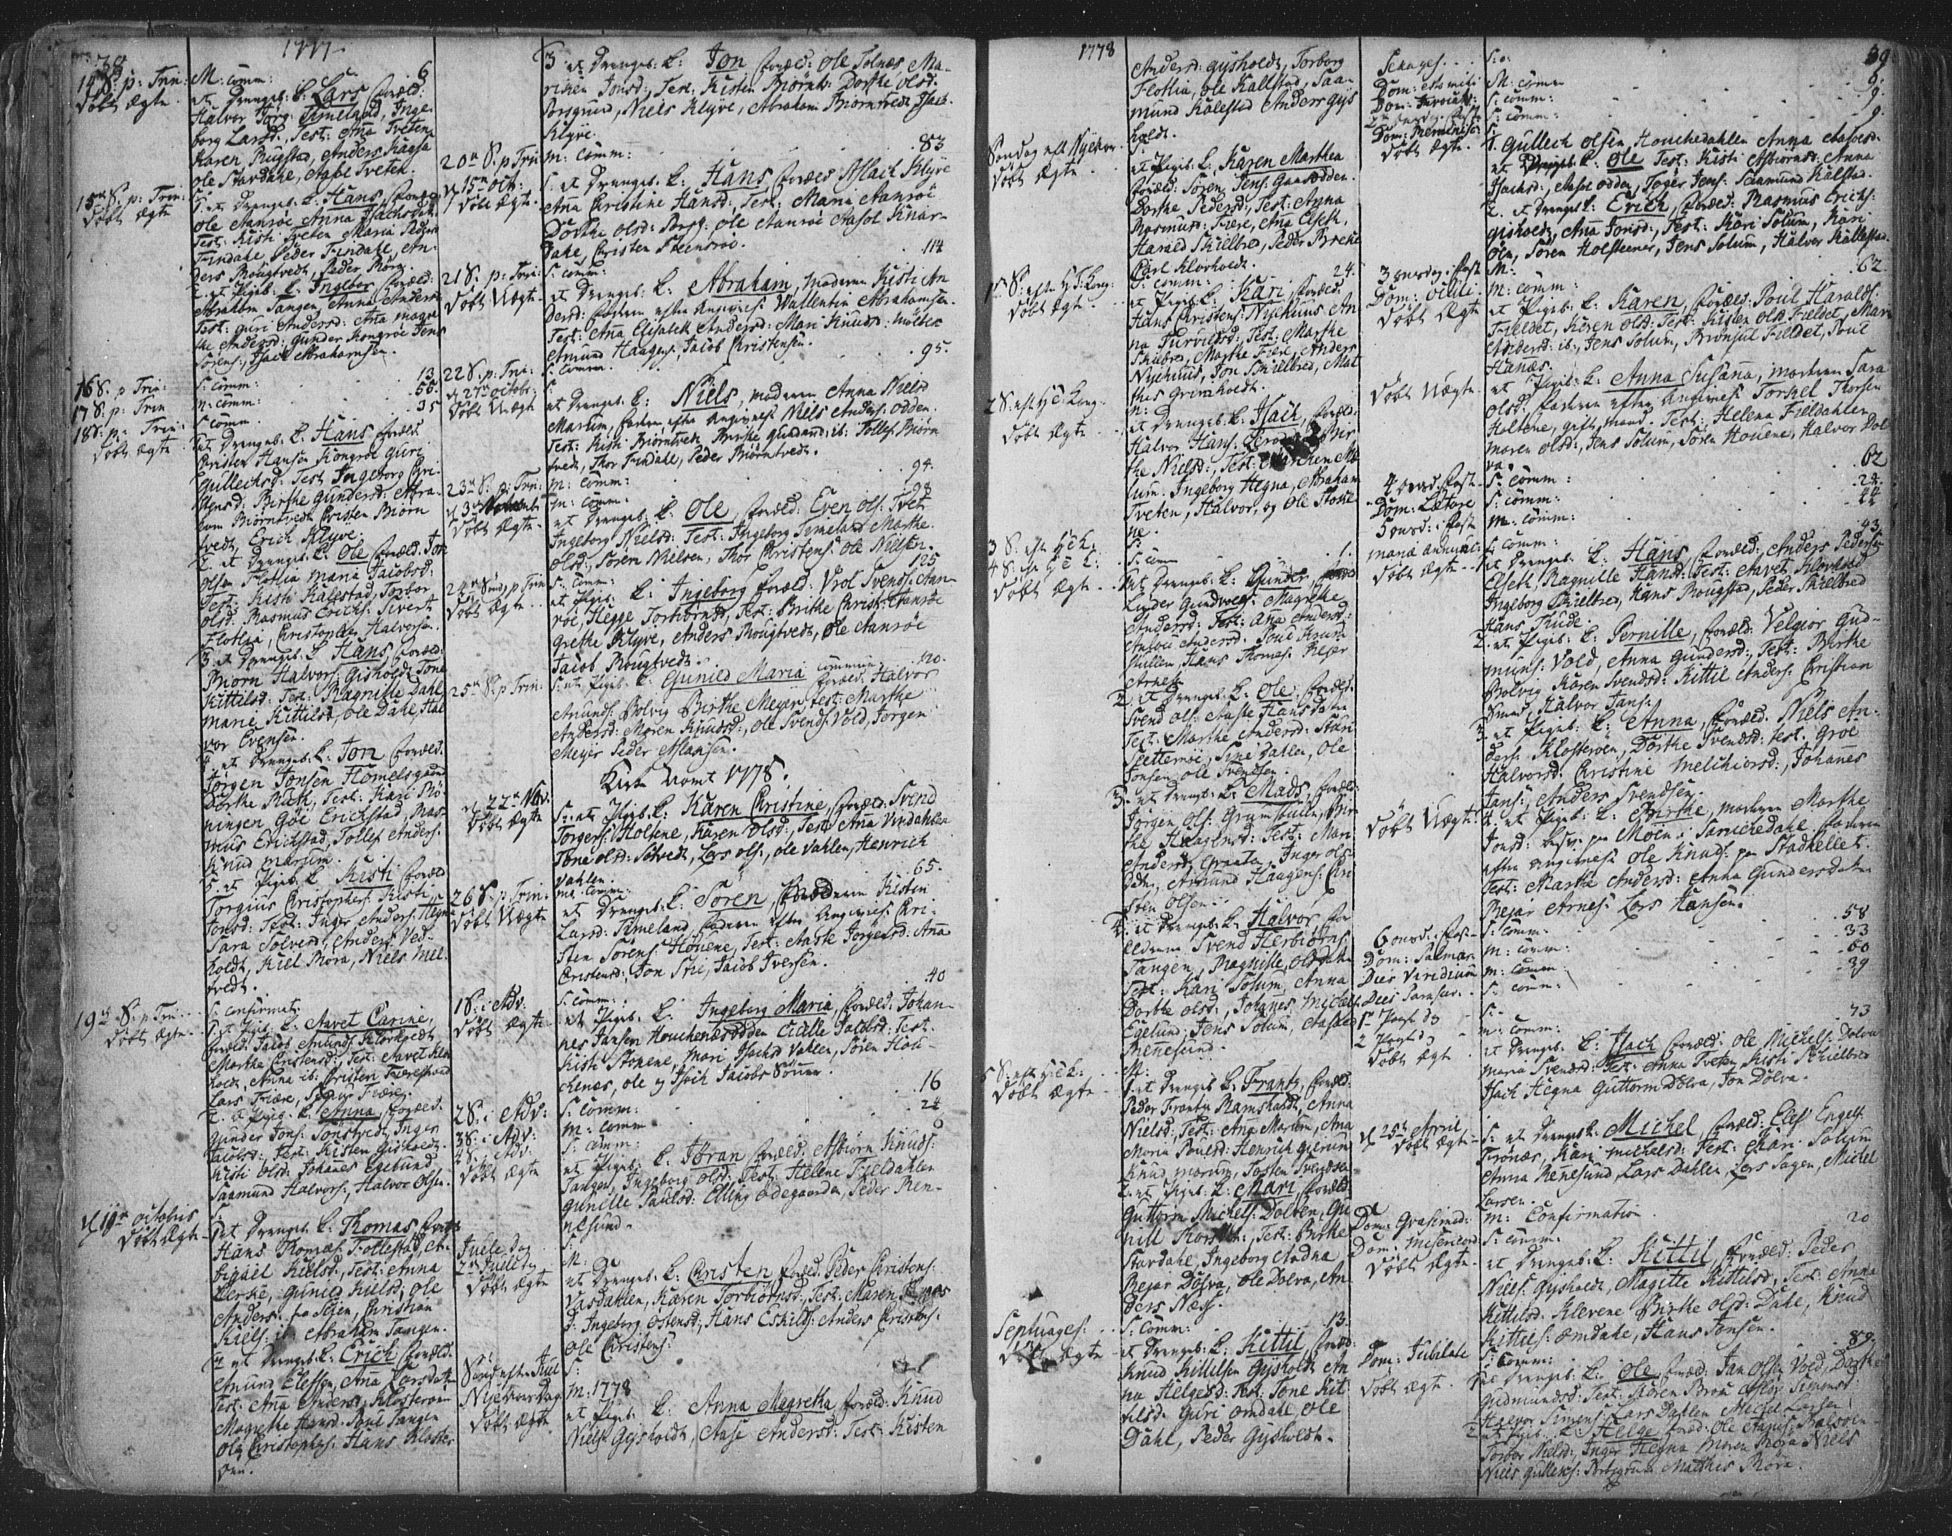 SAKO, Solum kirkebøker, F/Fa/L0003: Ministerialbok nr. I 3, 1761-1814, s. 38-39